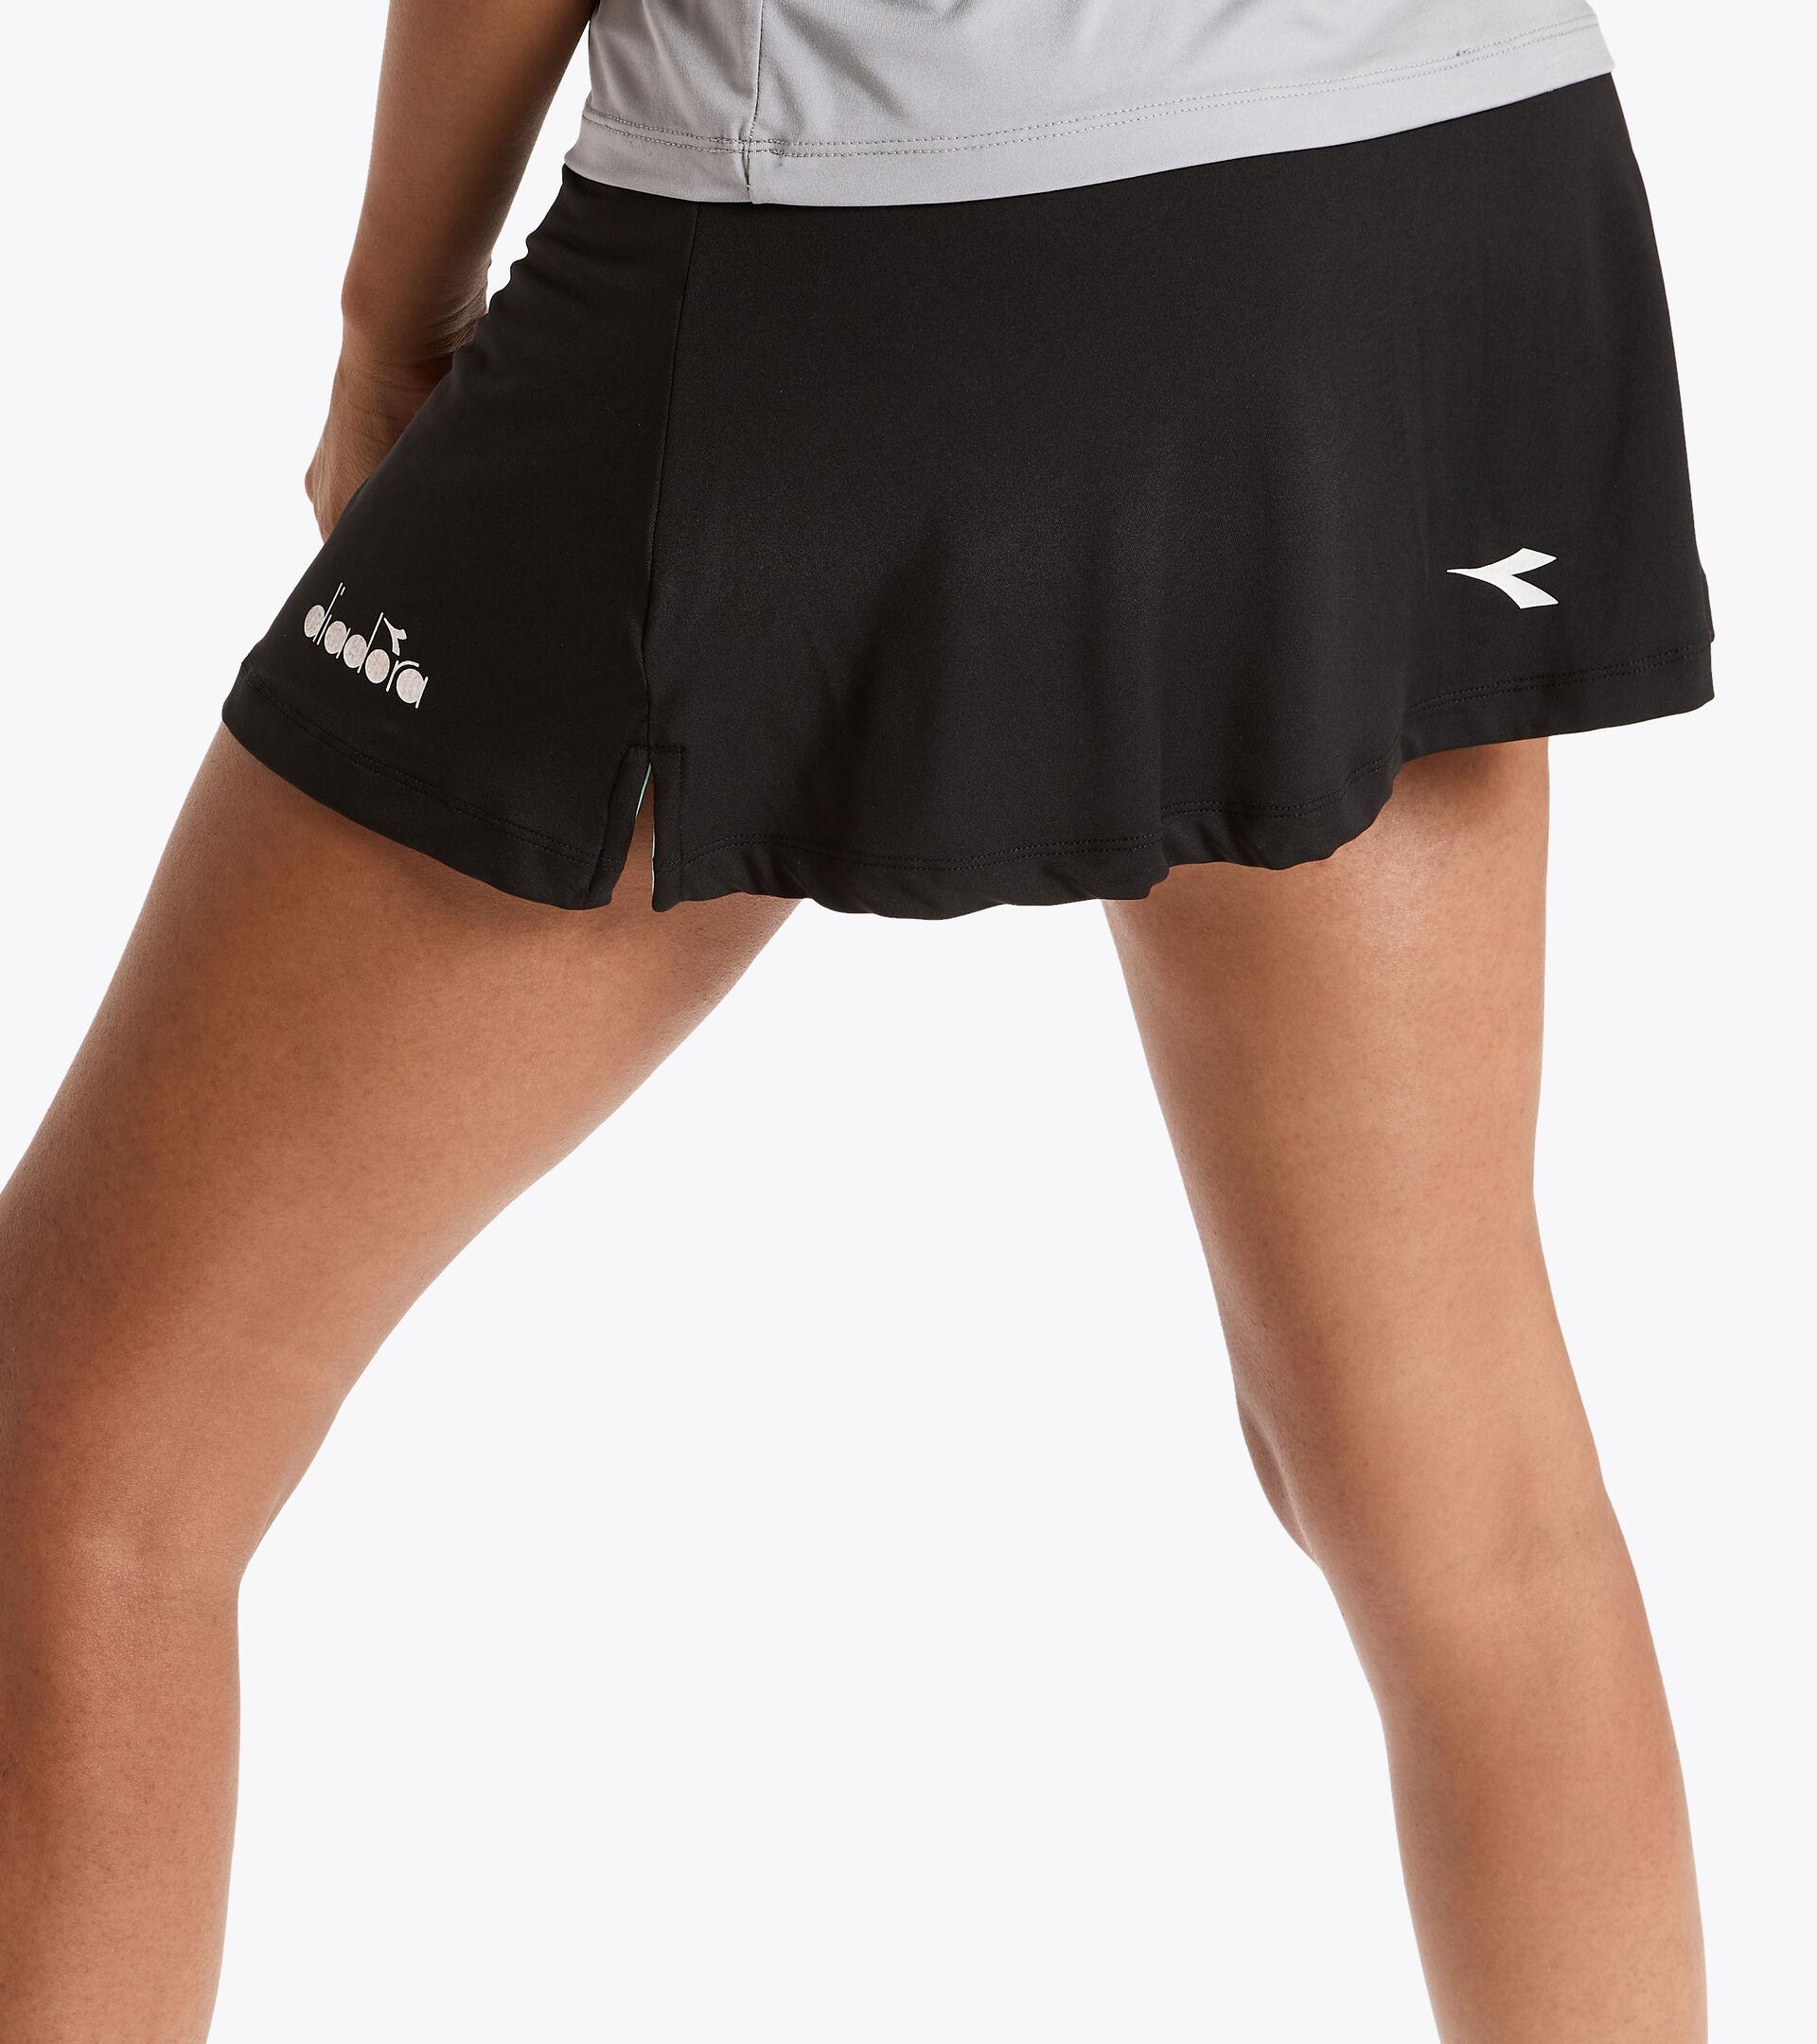 Apparel Sport DONNA L. SKIRT EASY TENNIS BLACK Diadora